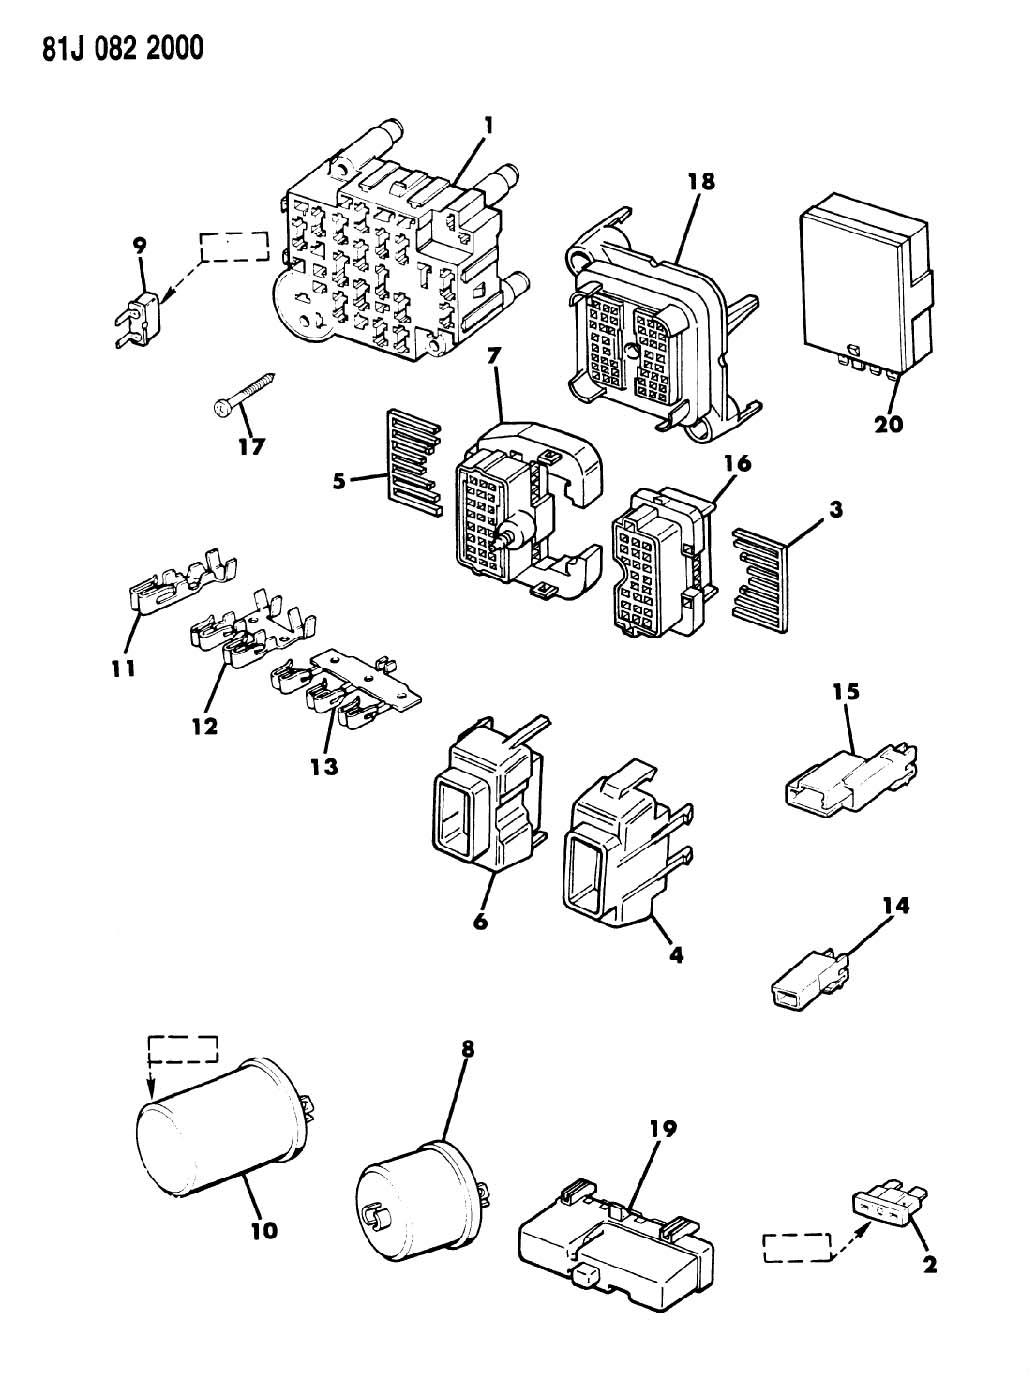 Jeep Grand Cherokee Zj Fuse Box Diagram